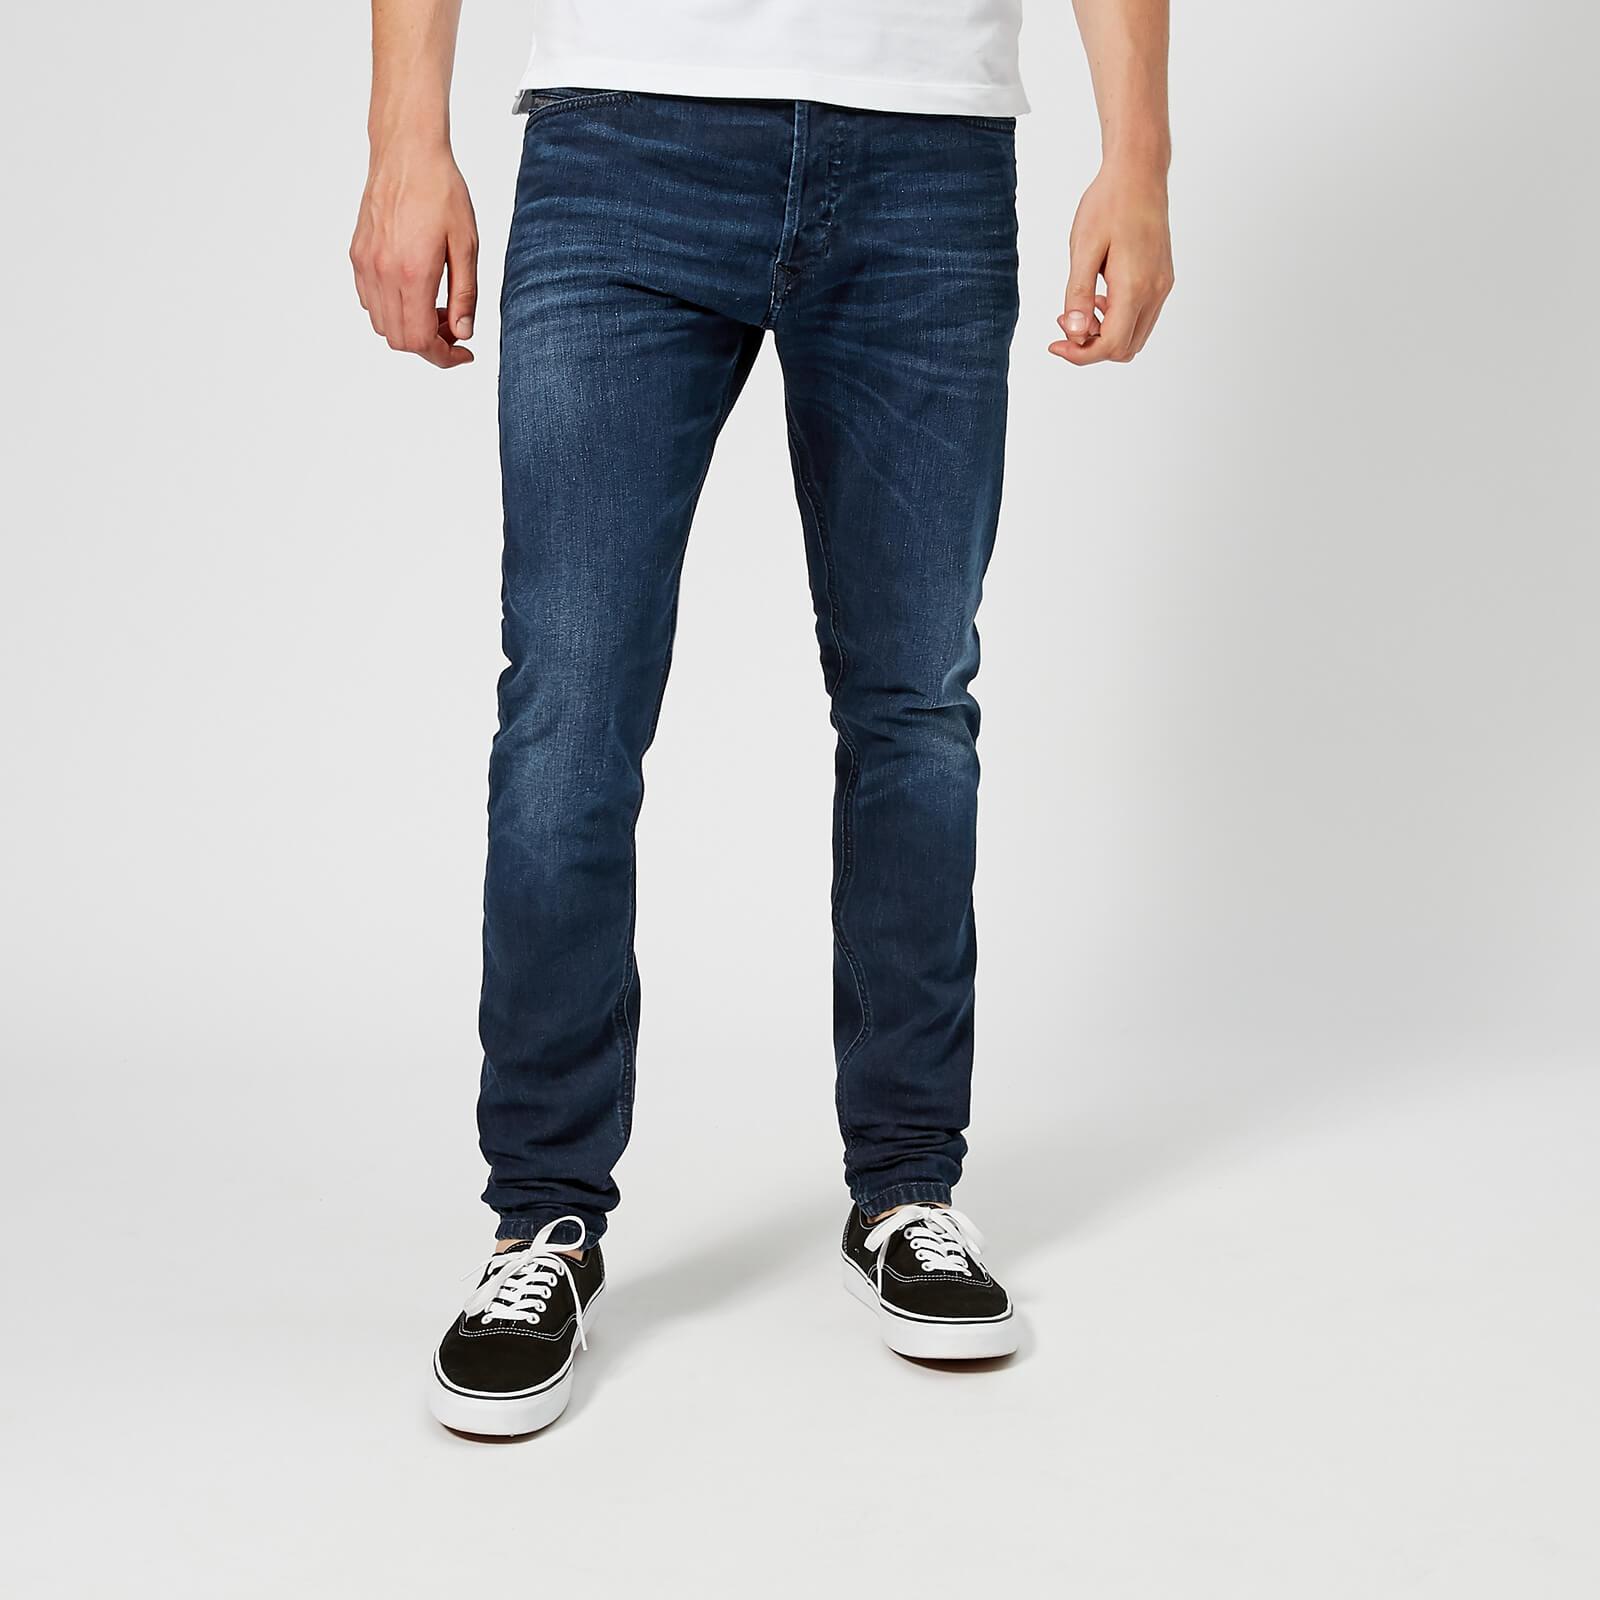 0d6a5045 Diesel Men's Tepphar Slim Carrot Jeans - Blue Mens Clothing | TheHut.com